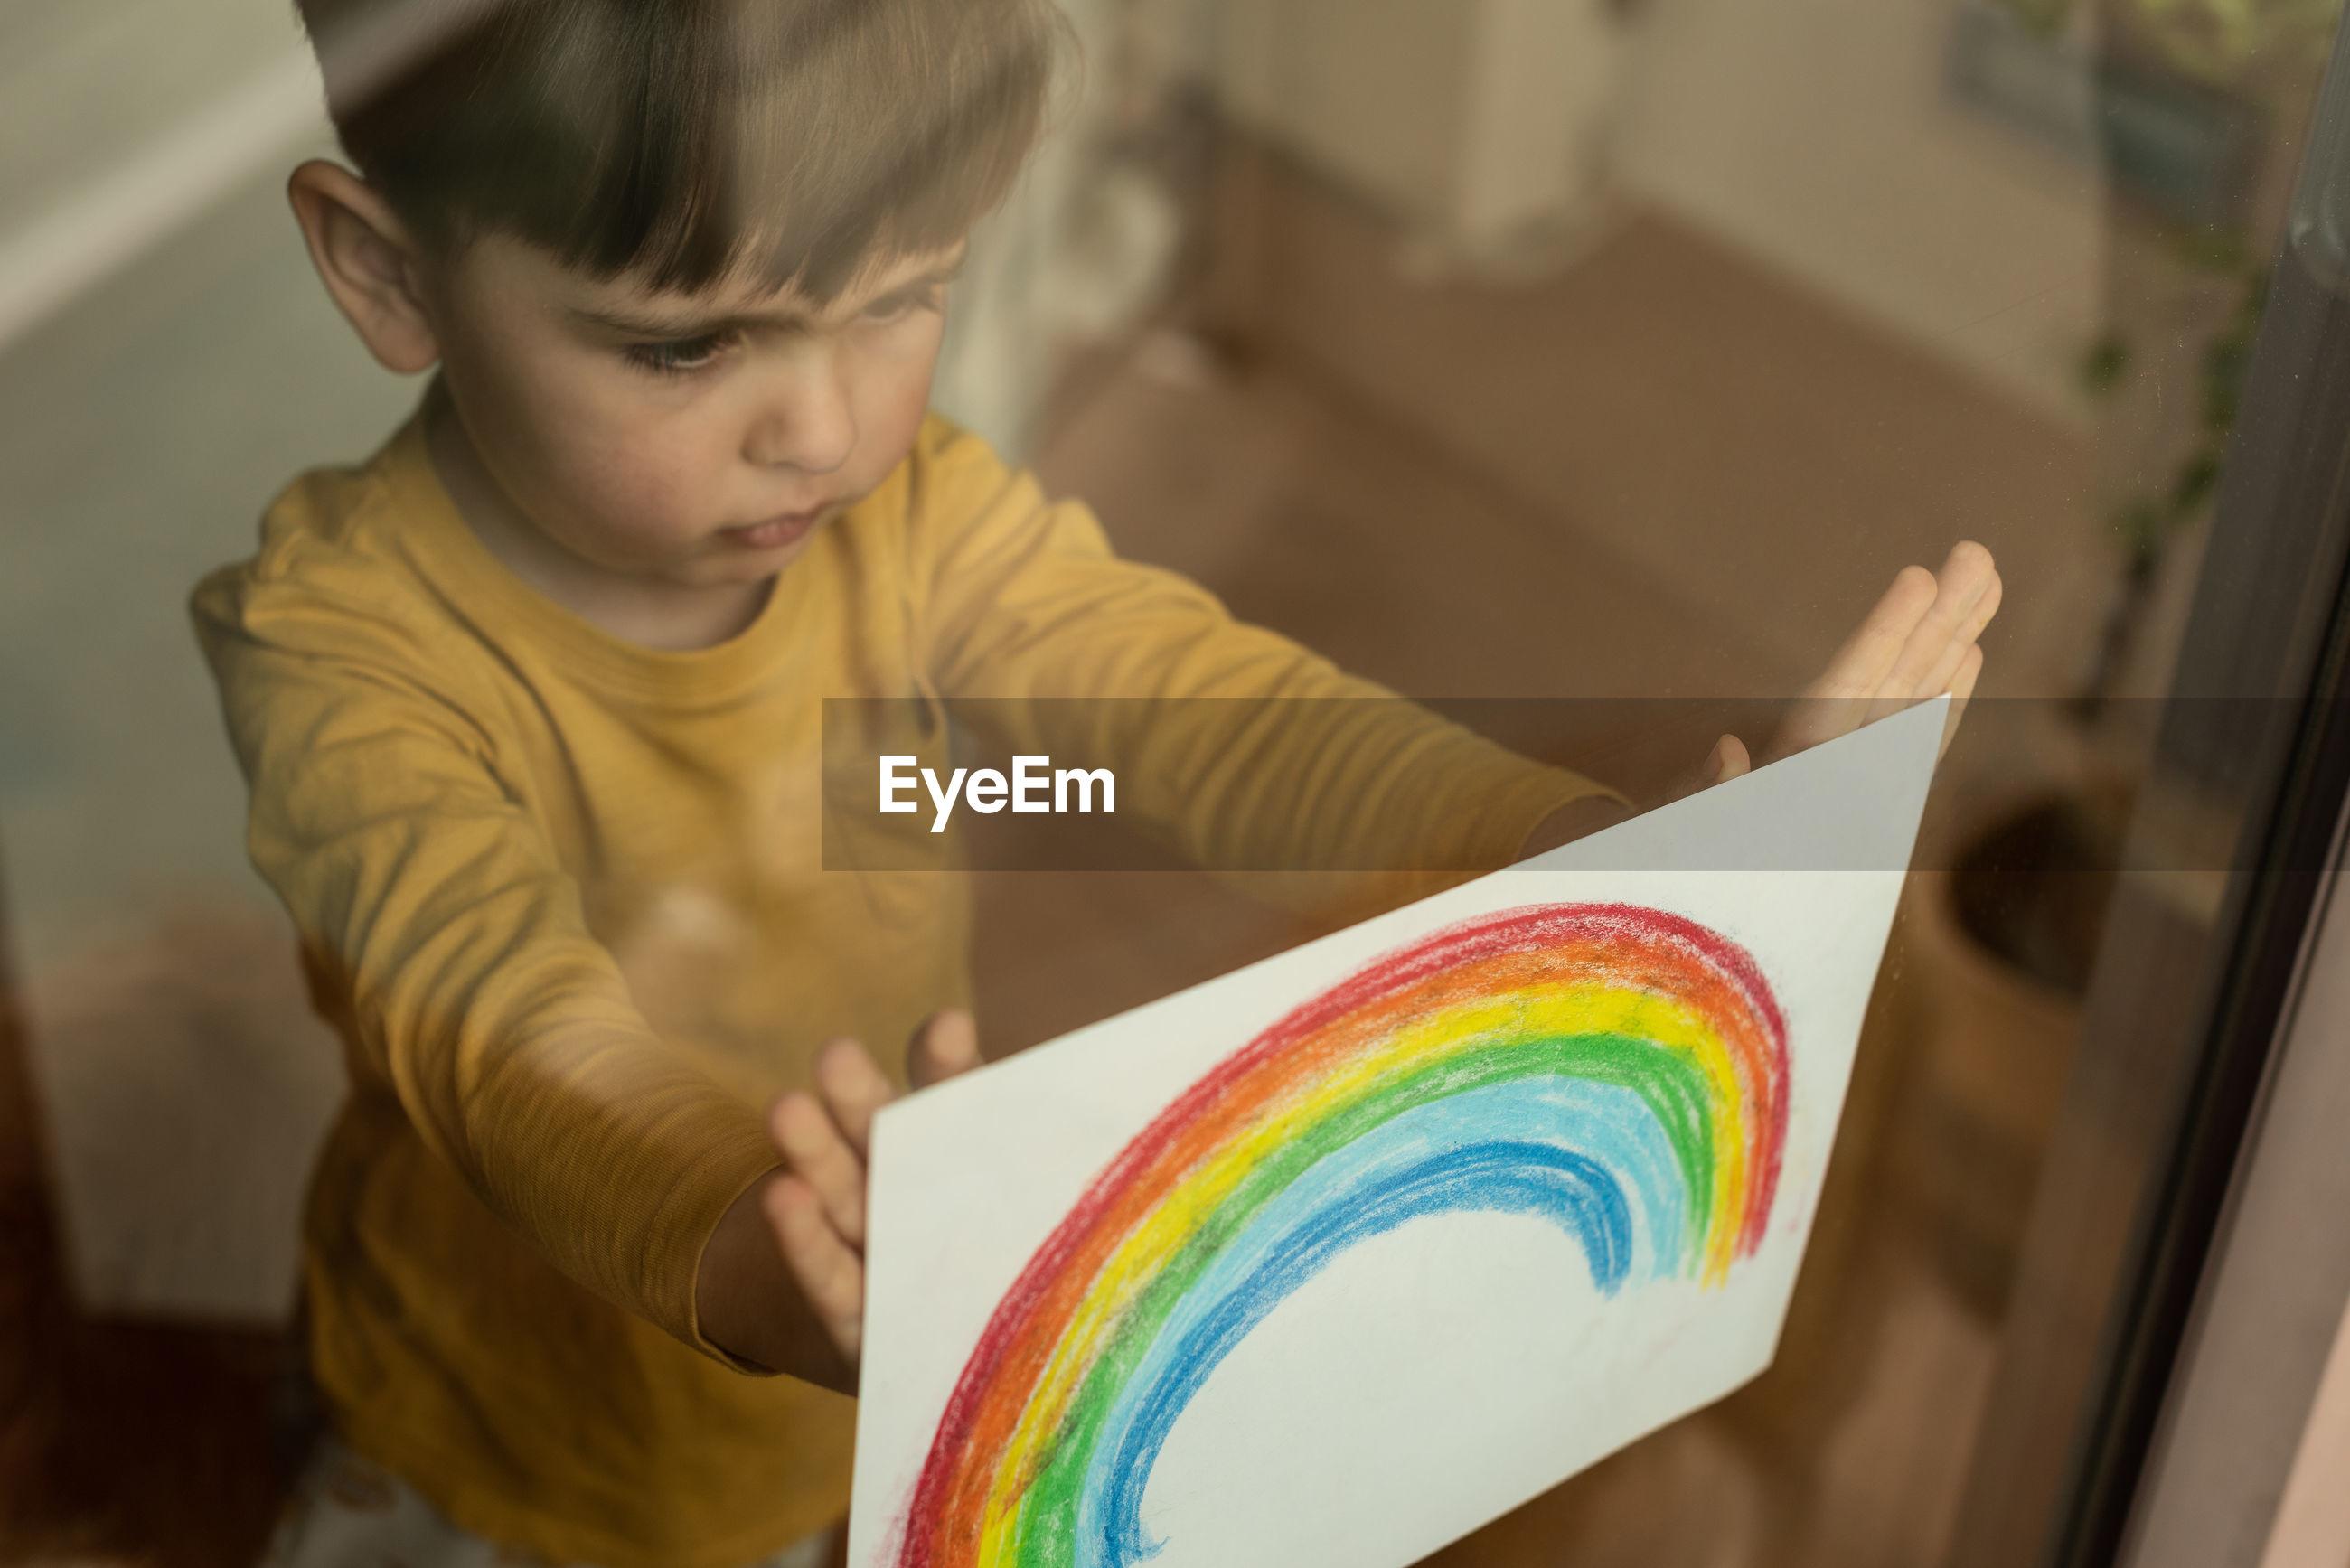 Boy holding rainbow drawing seen through window